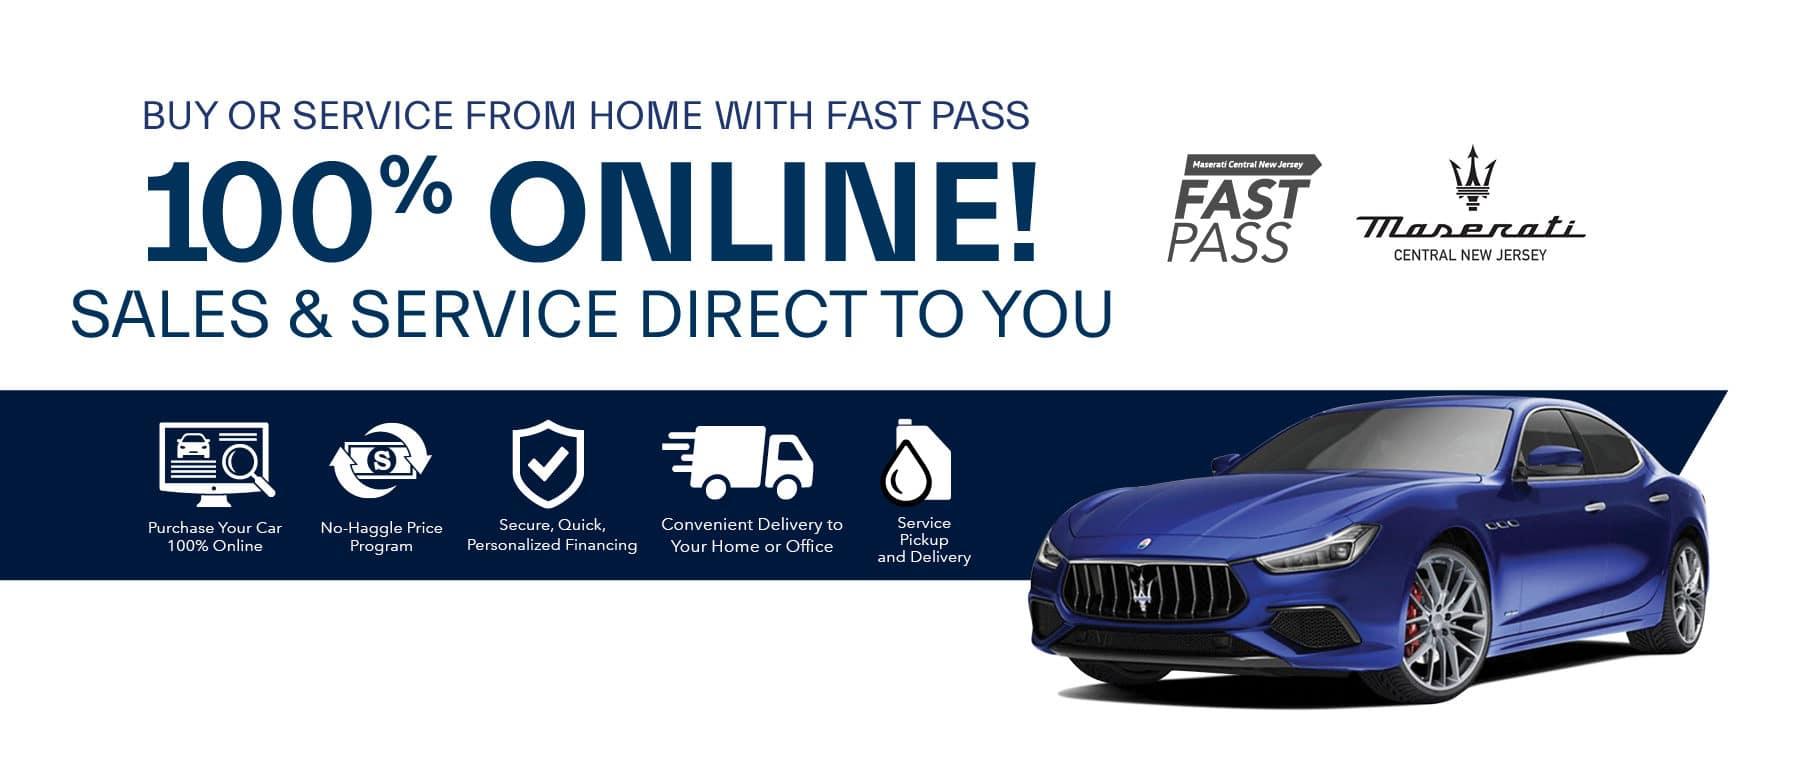 blue new Maserati 100% ONLINE Fast Pass